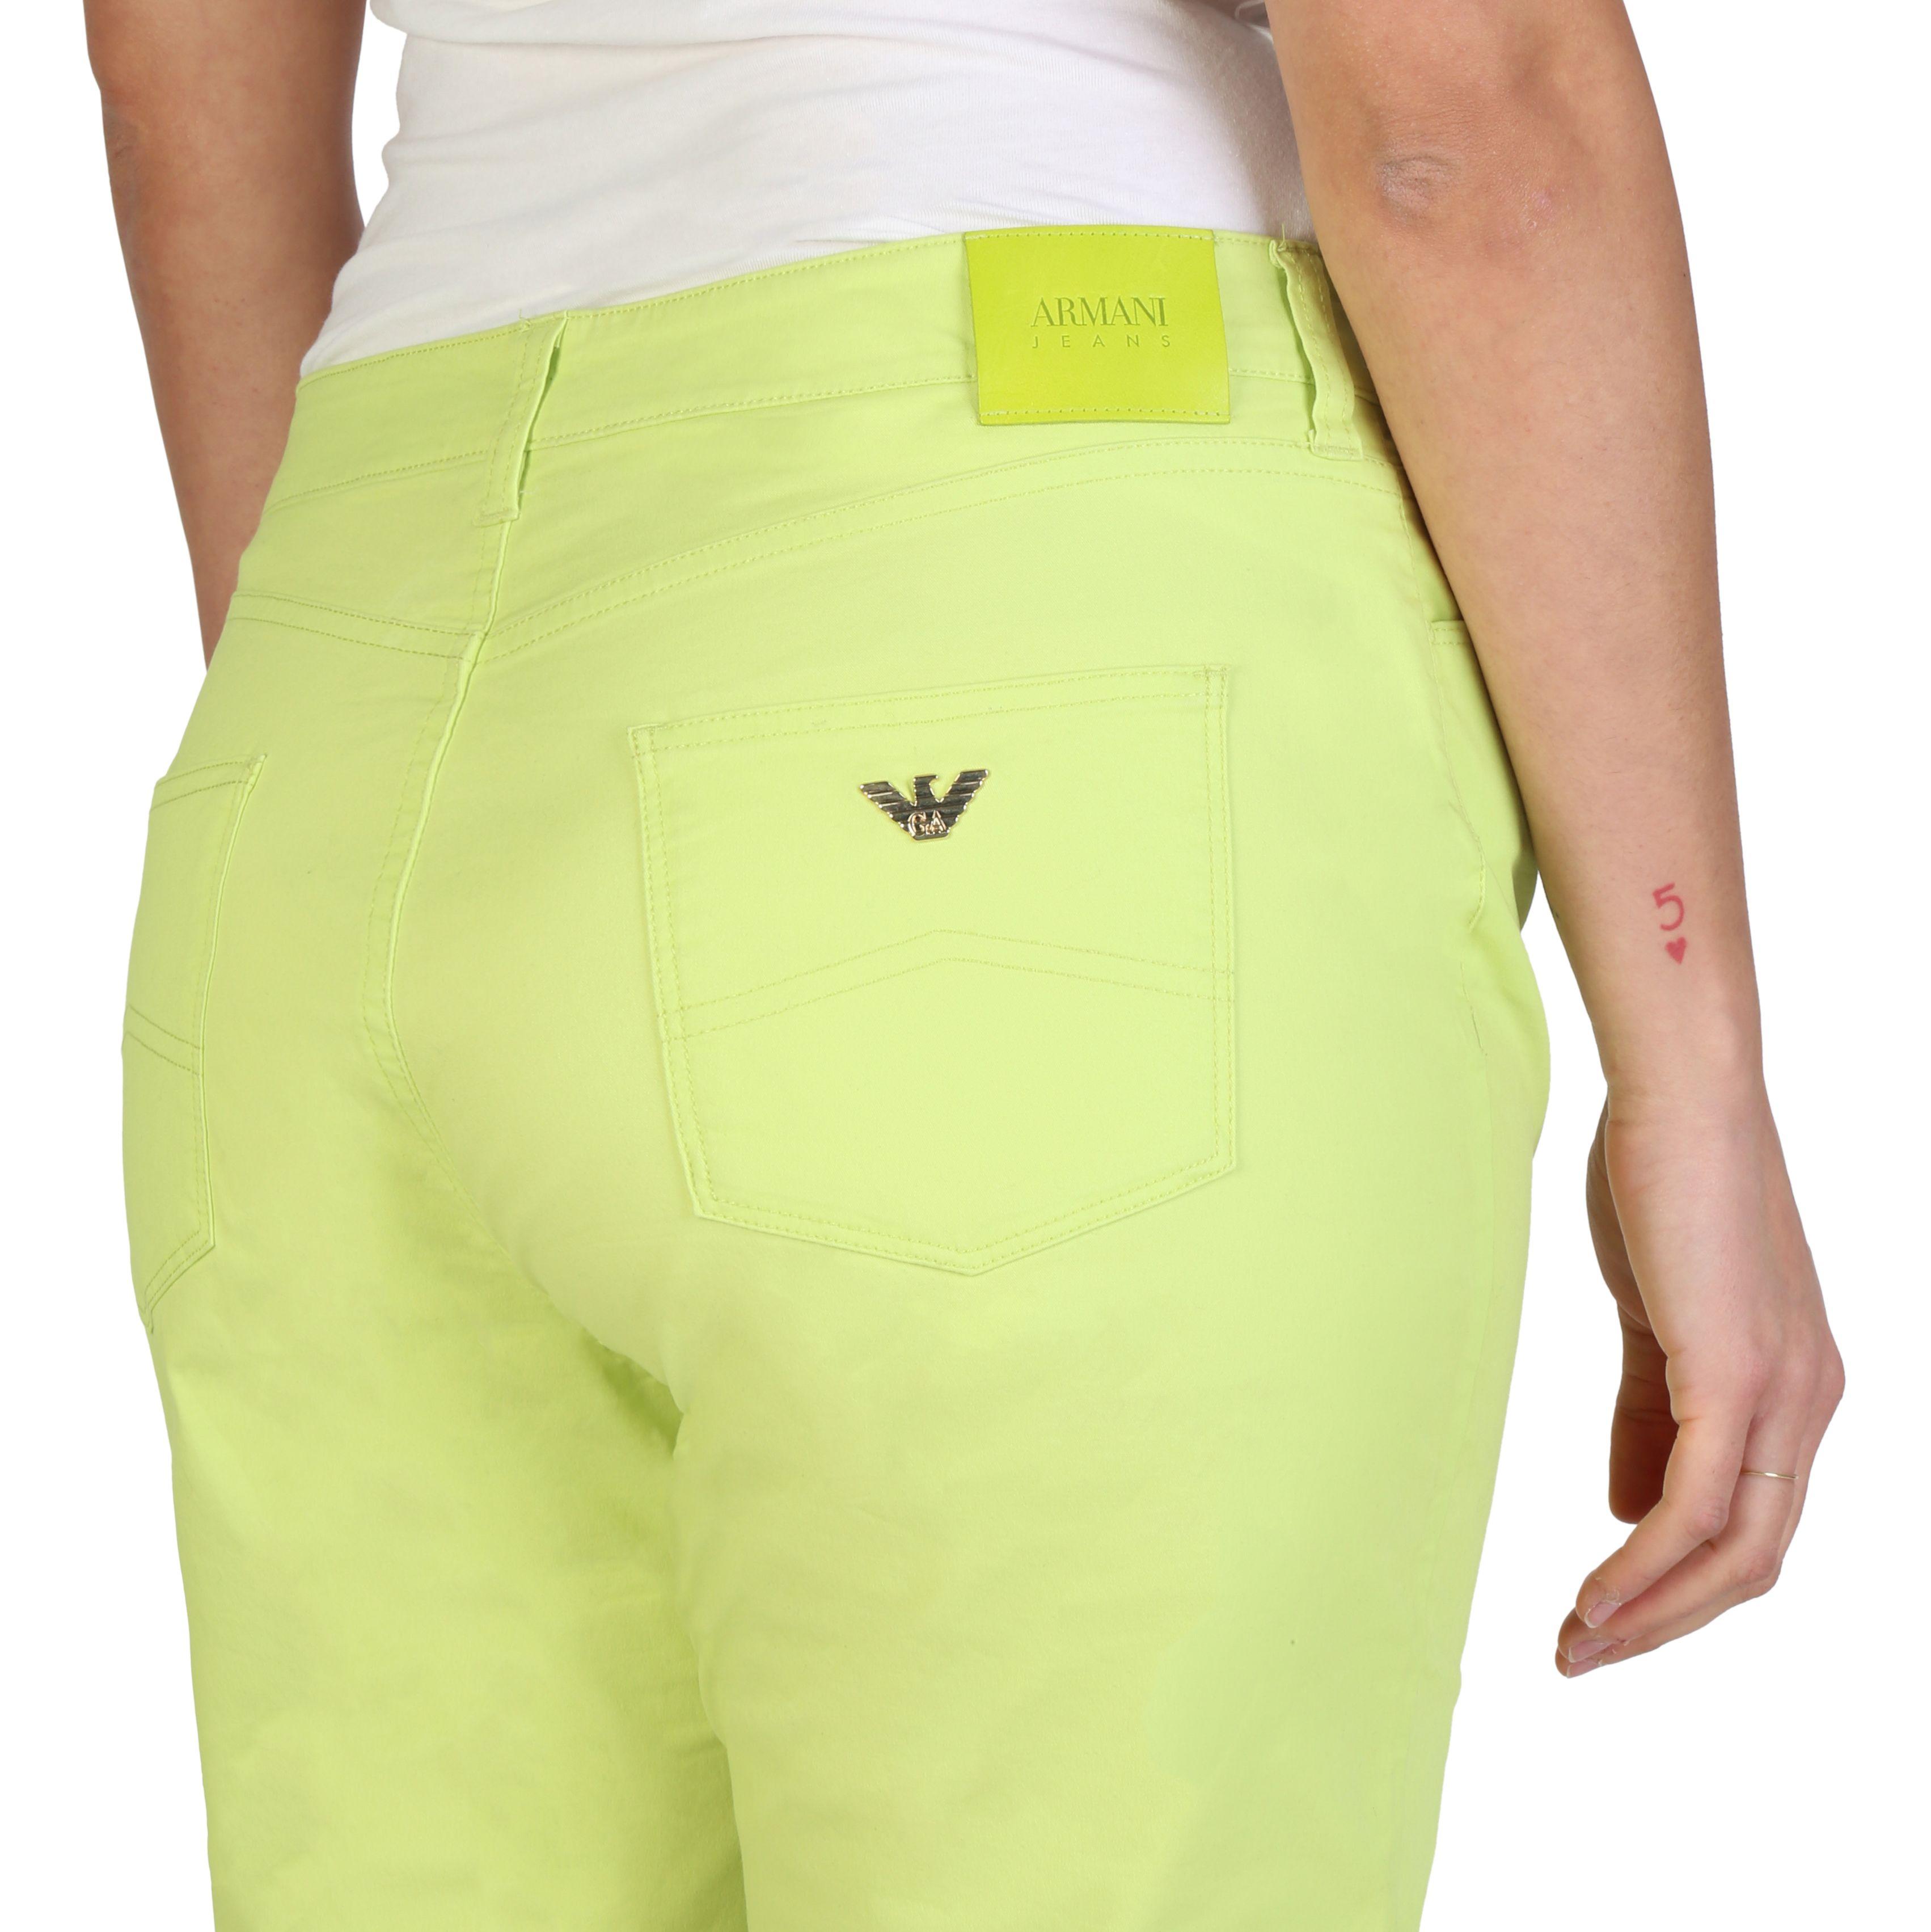 330F7770 Aa62 11Ea Aaa4 4Fcd1Fe36E6D Armani Jeans - 3Y5J18_5Nzxz - Green